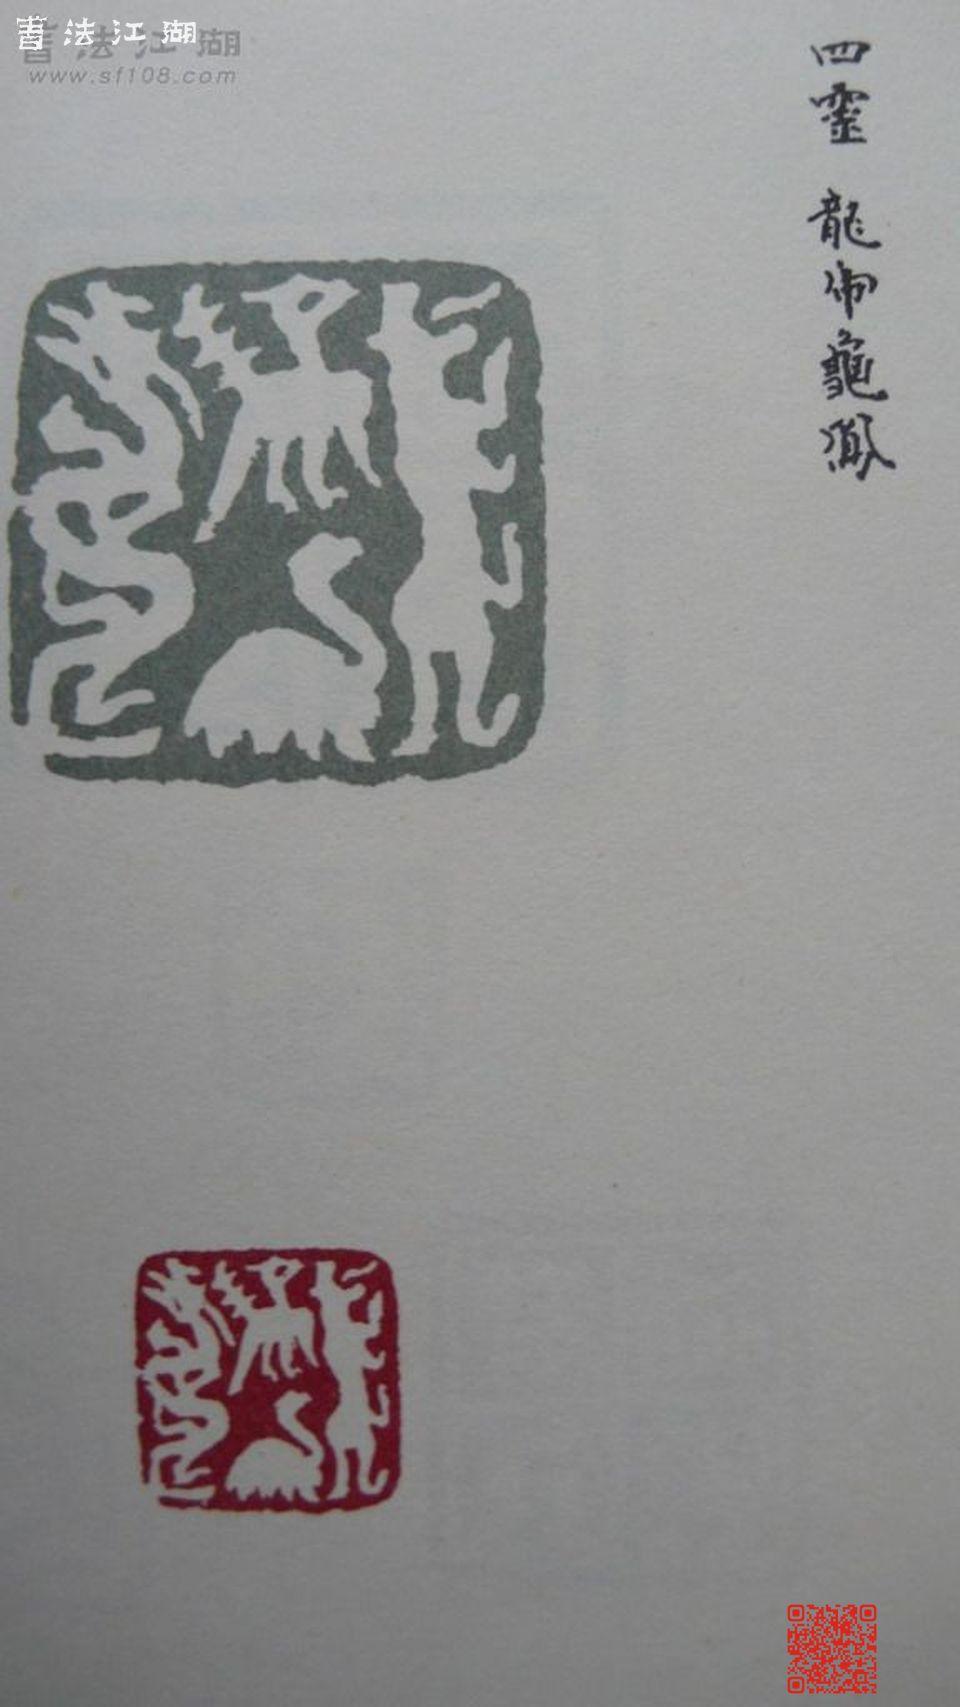 P1100543.JPG